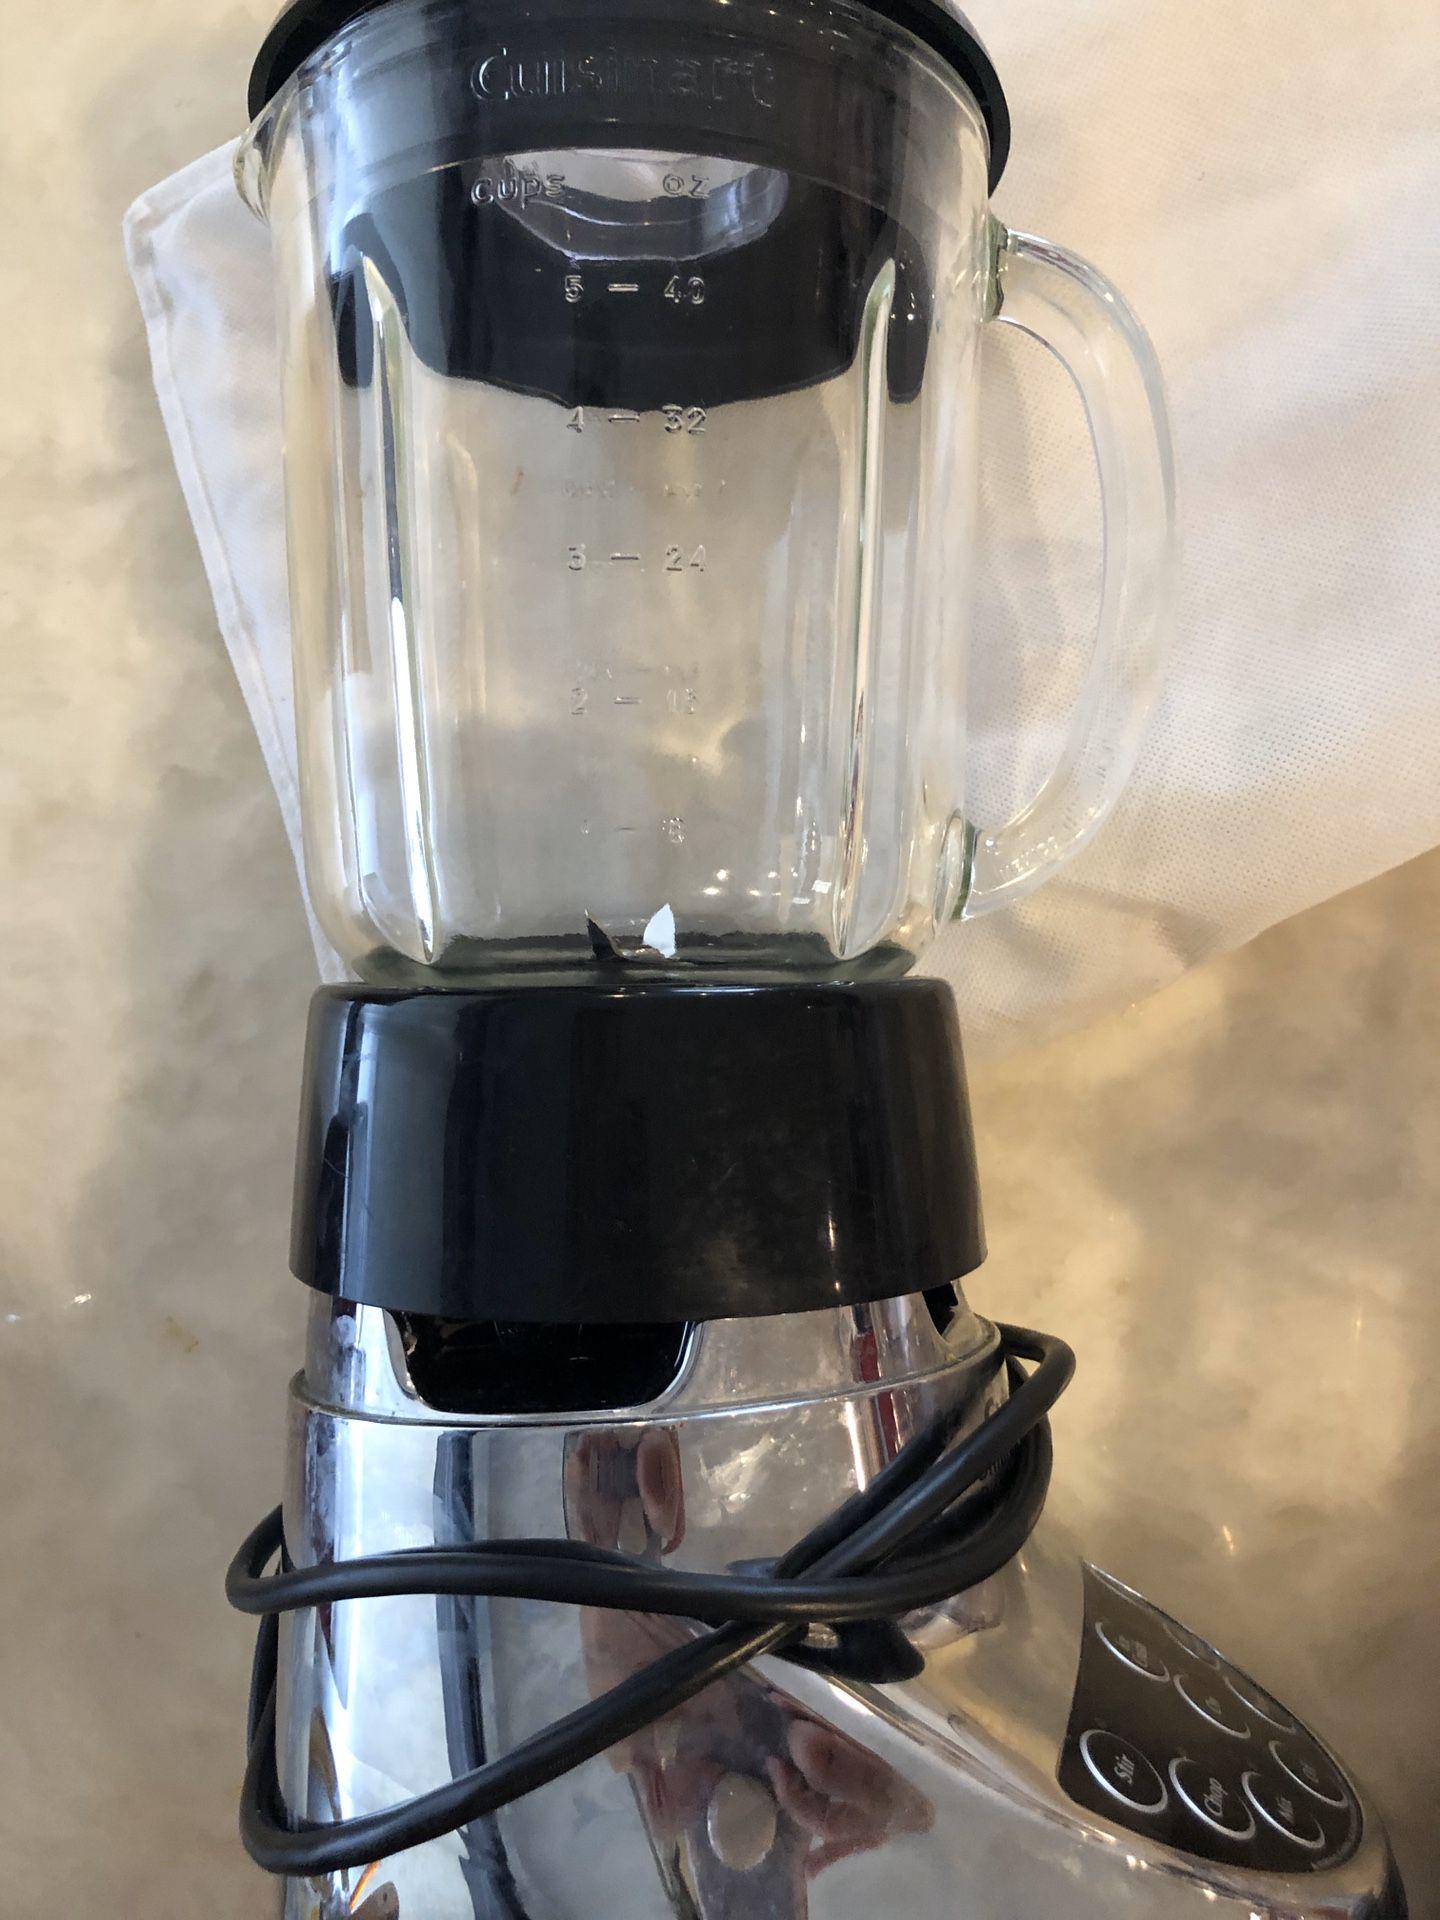 Cuisinart Blender and Food Processor